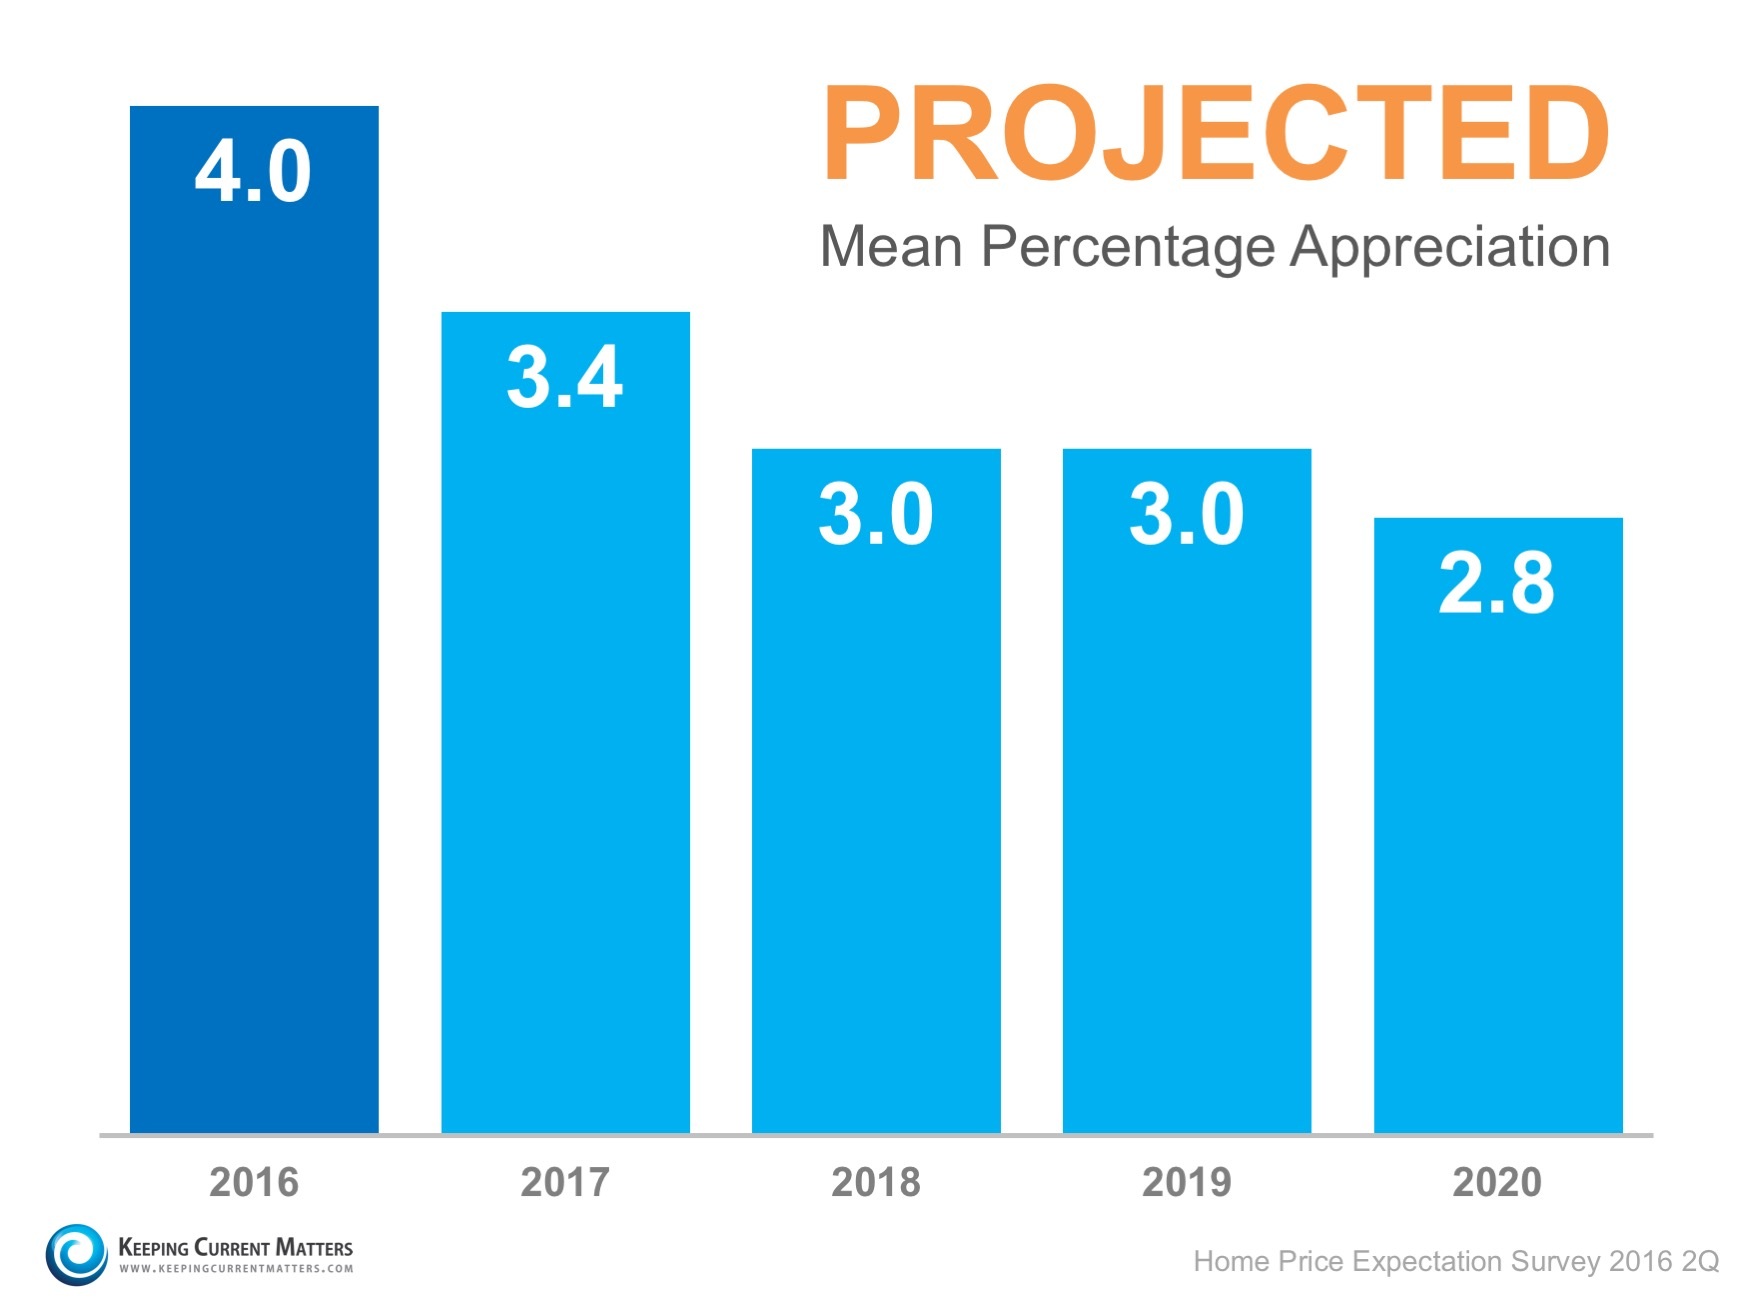 A graph of projected mean percentage appreciation